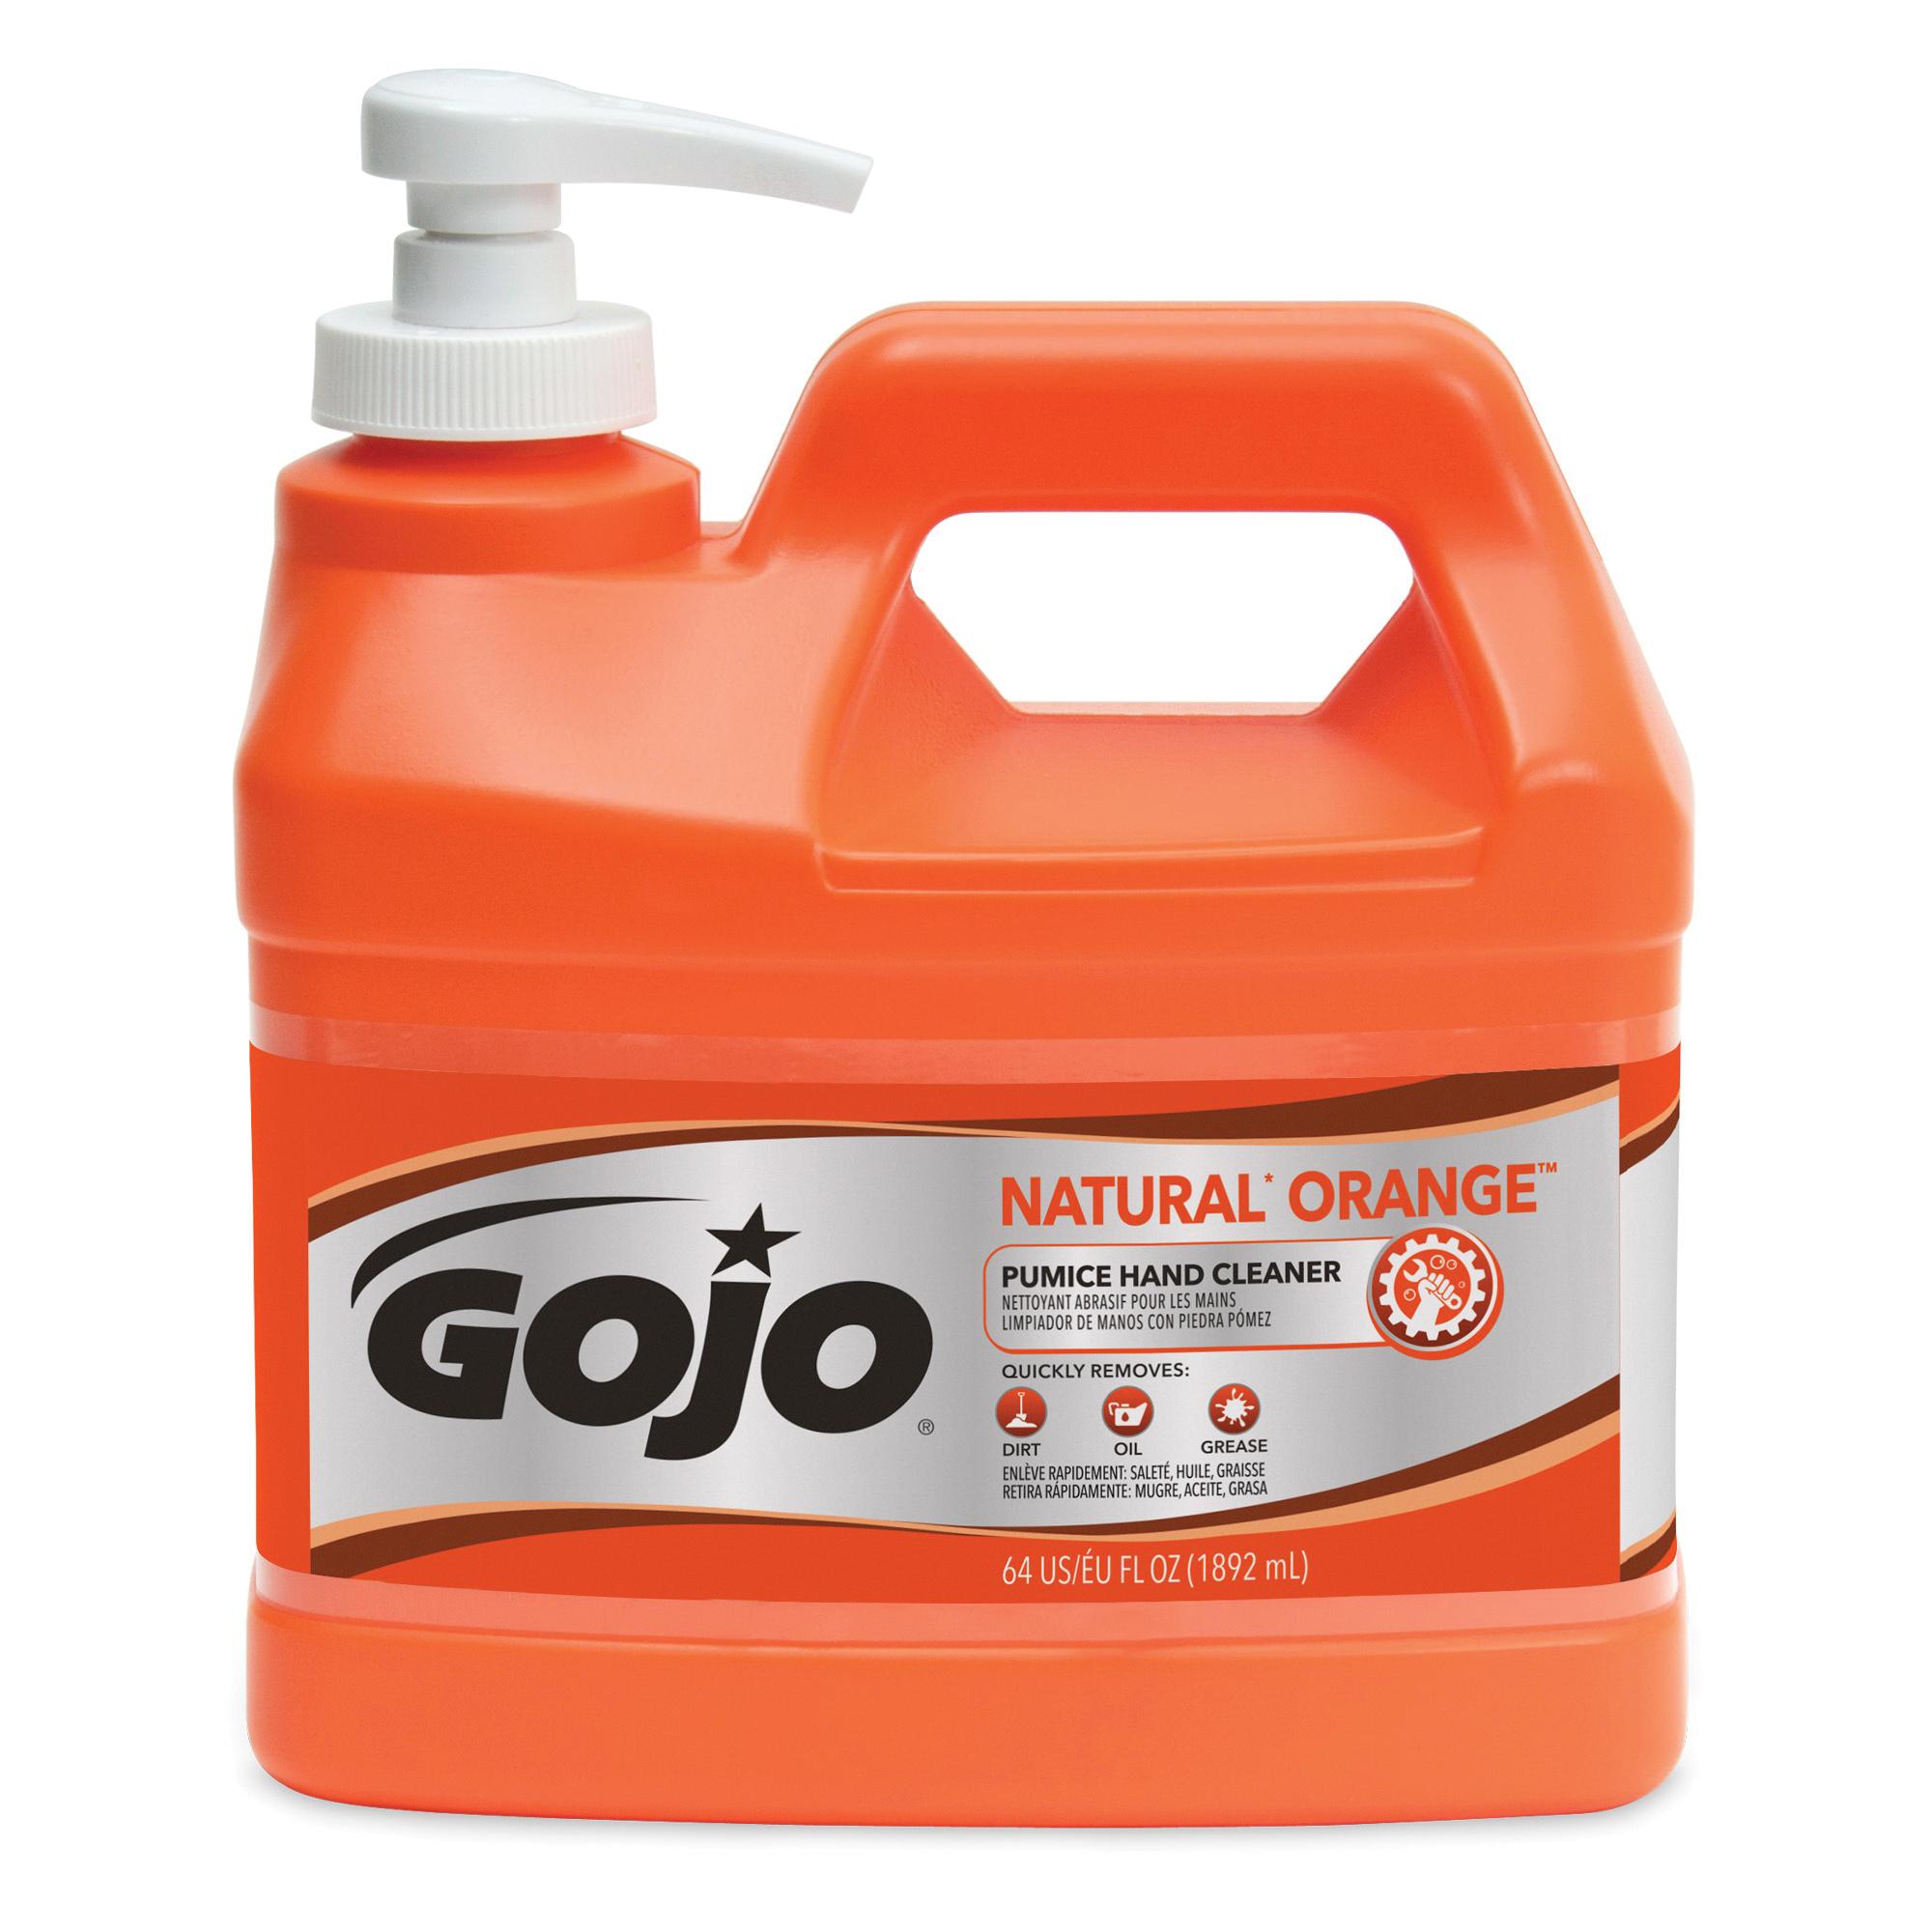 GOJO® 0957-12 NATURAL ORANGE™ Pumice Hand Cleaner With Pumice Scrubbers, 14 fl-oz, Squeeze Bottle, Liquid, Citrus, Orange